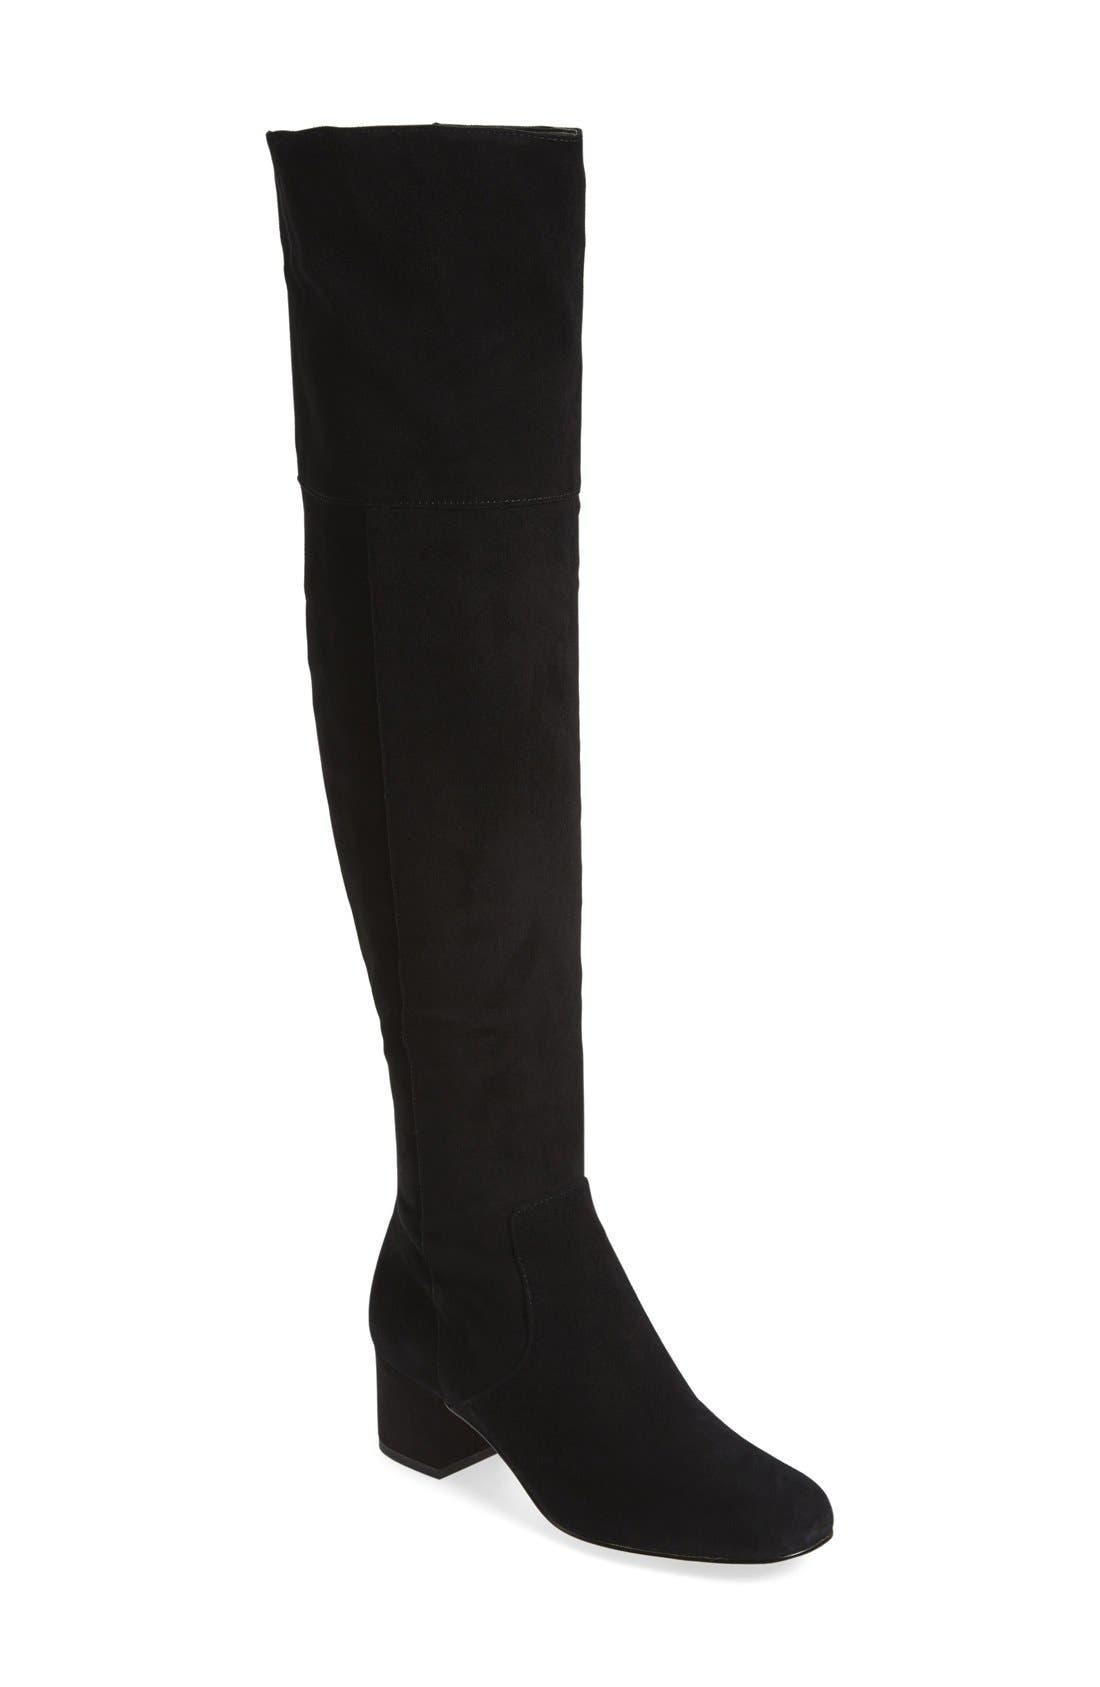 Main Image - Sam Edelman 'Elina' Over the Knee Boot (Women)